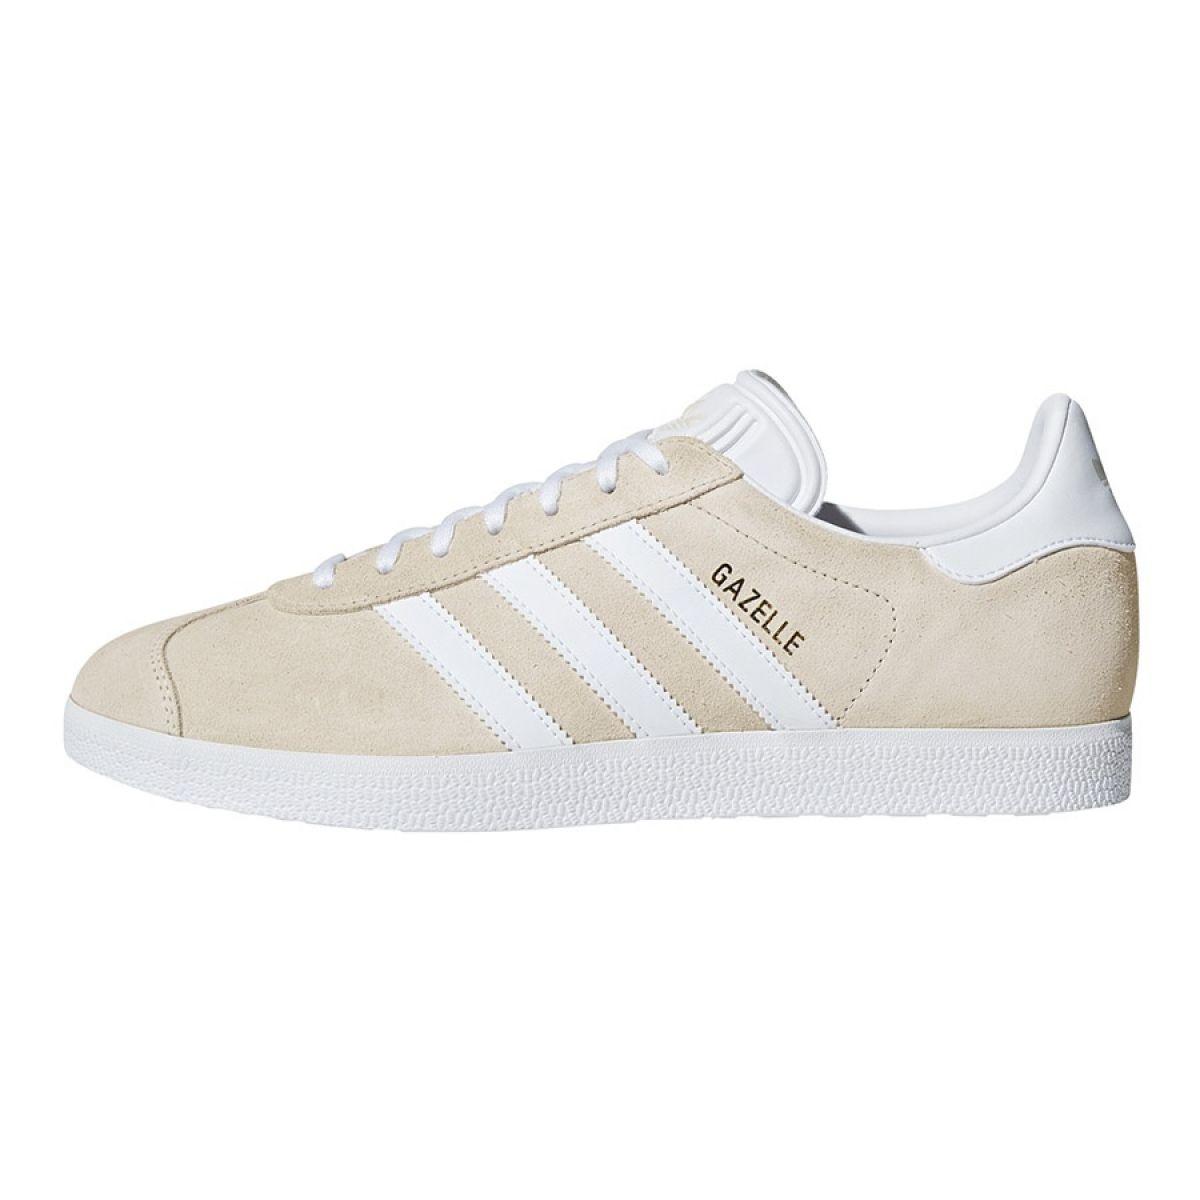 Adidas Originals Gazelle W B41646 shoes beige